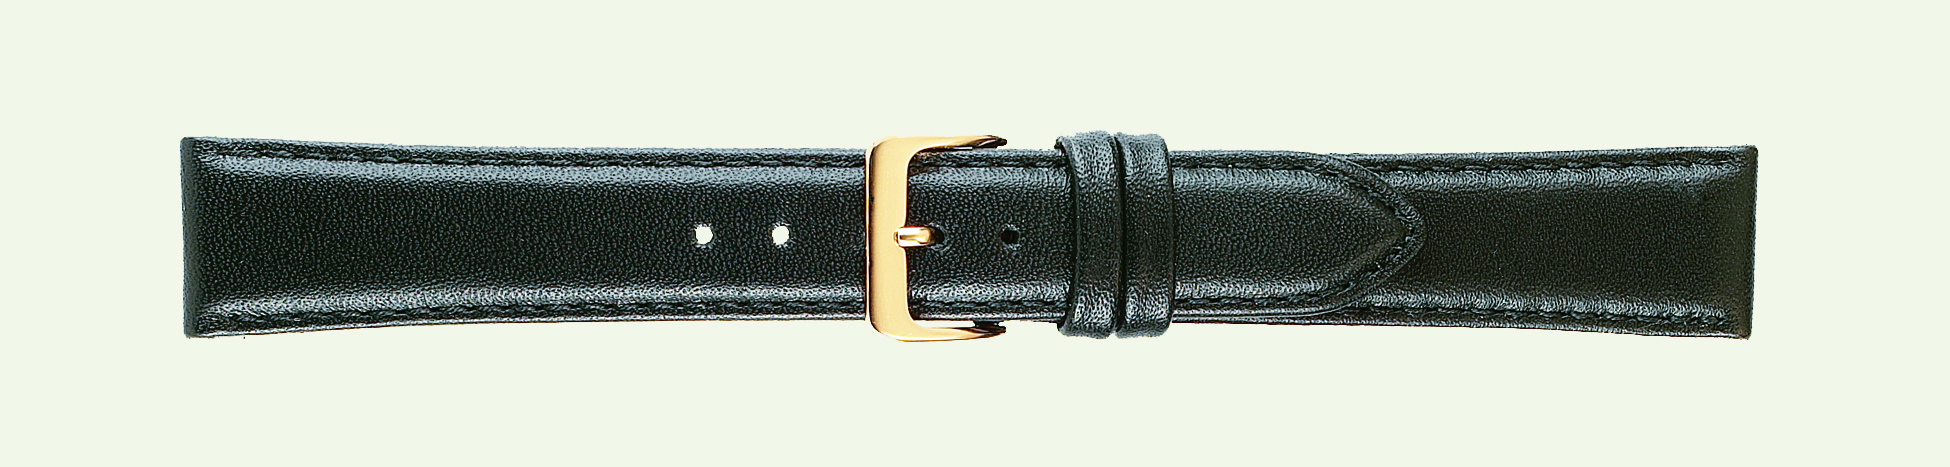 16MM Leather Band Black Classic Calf-0